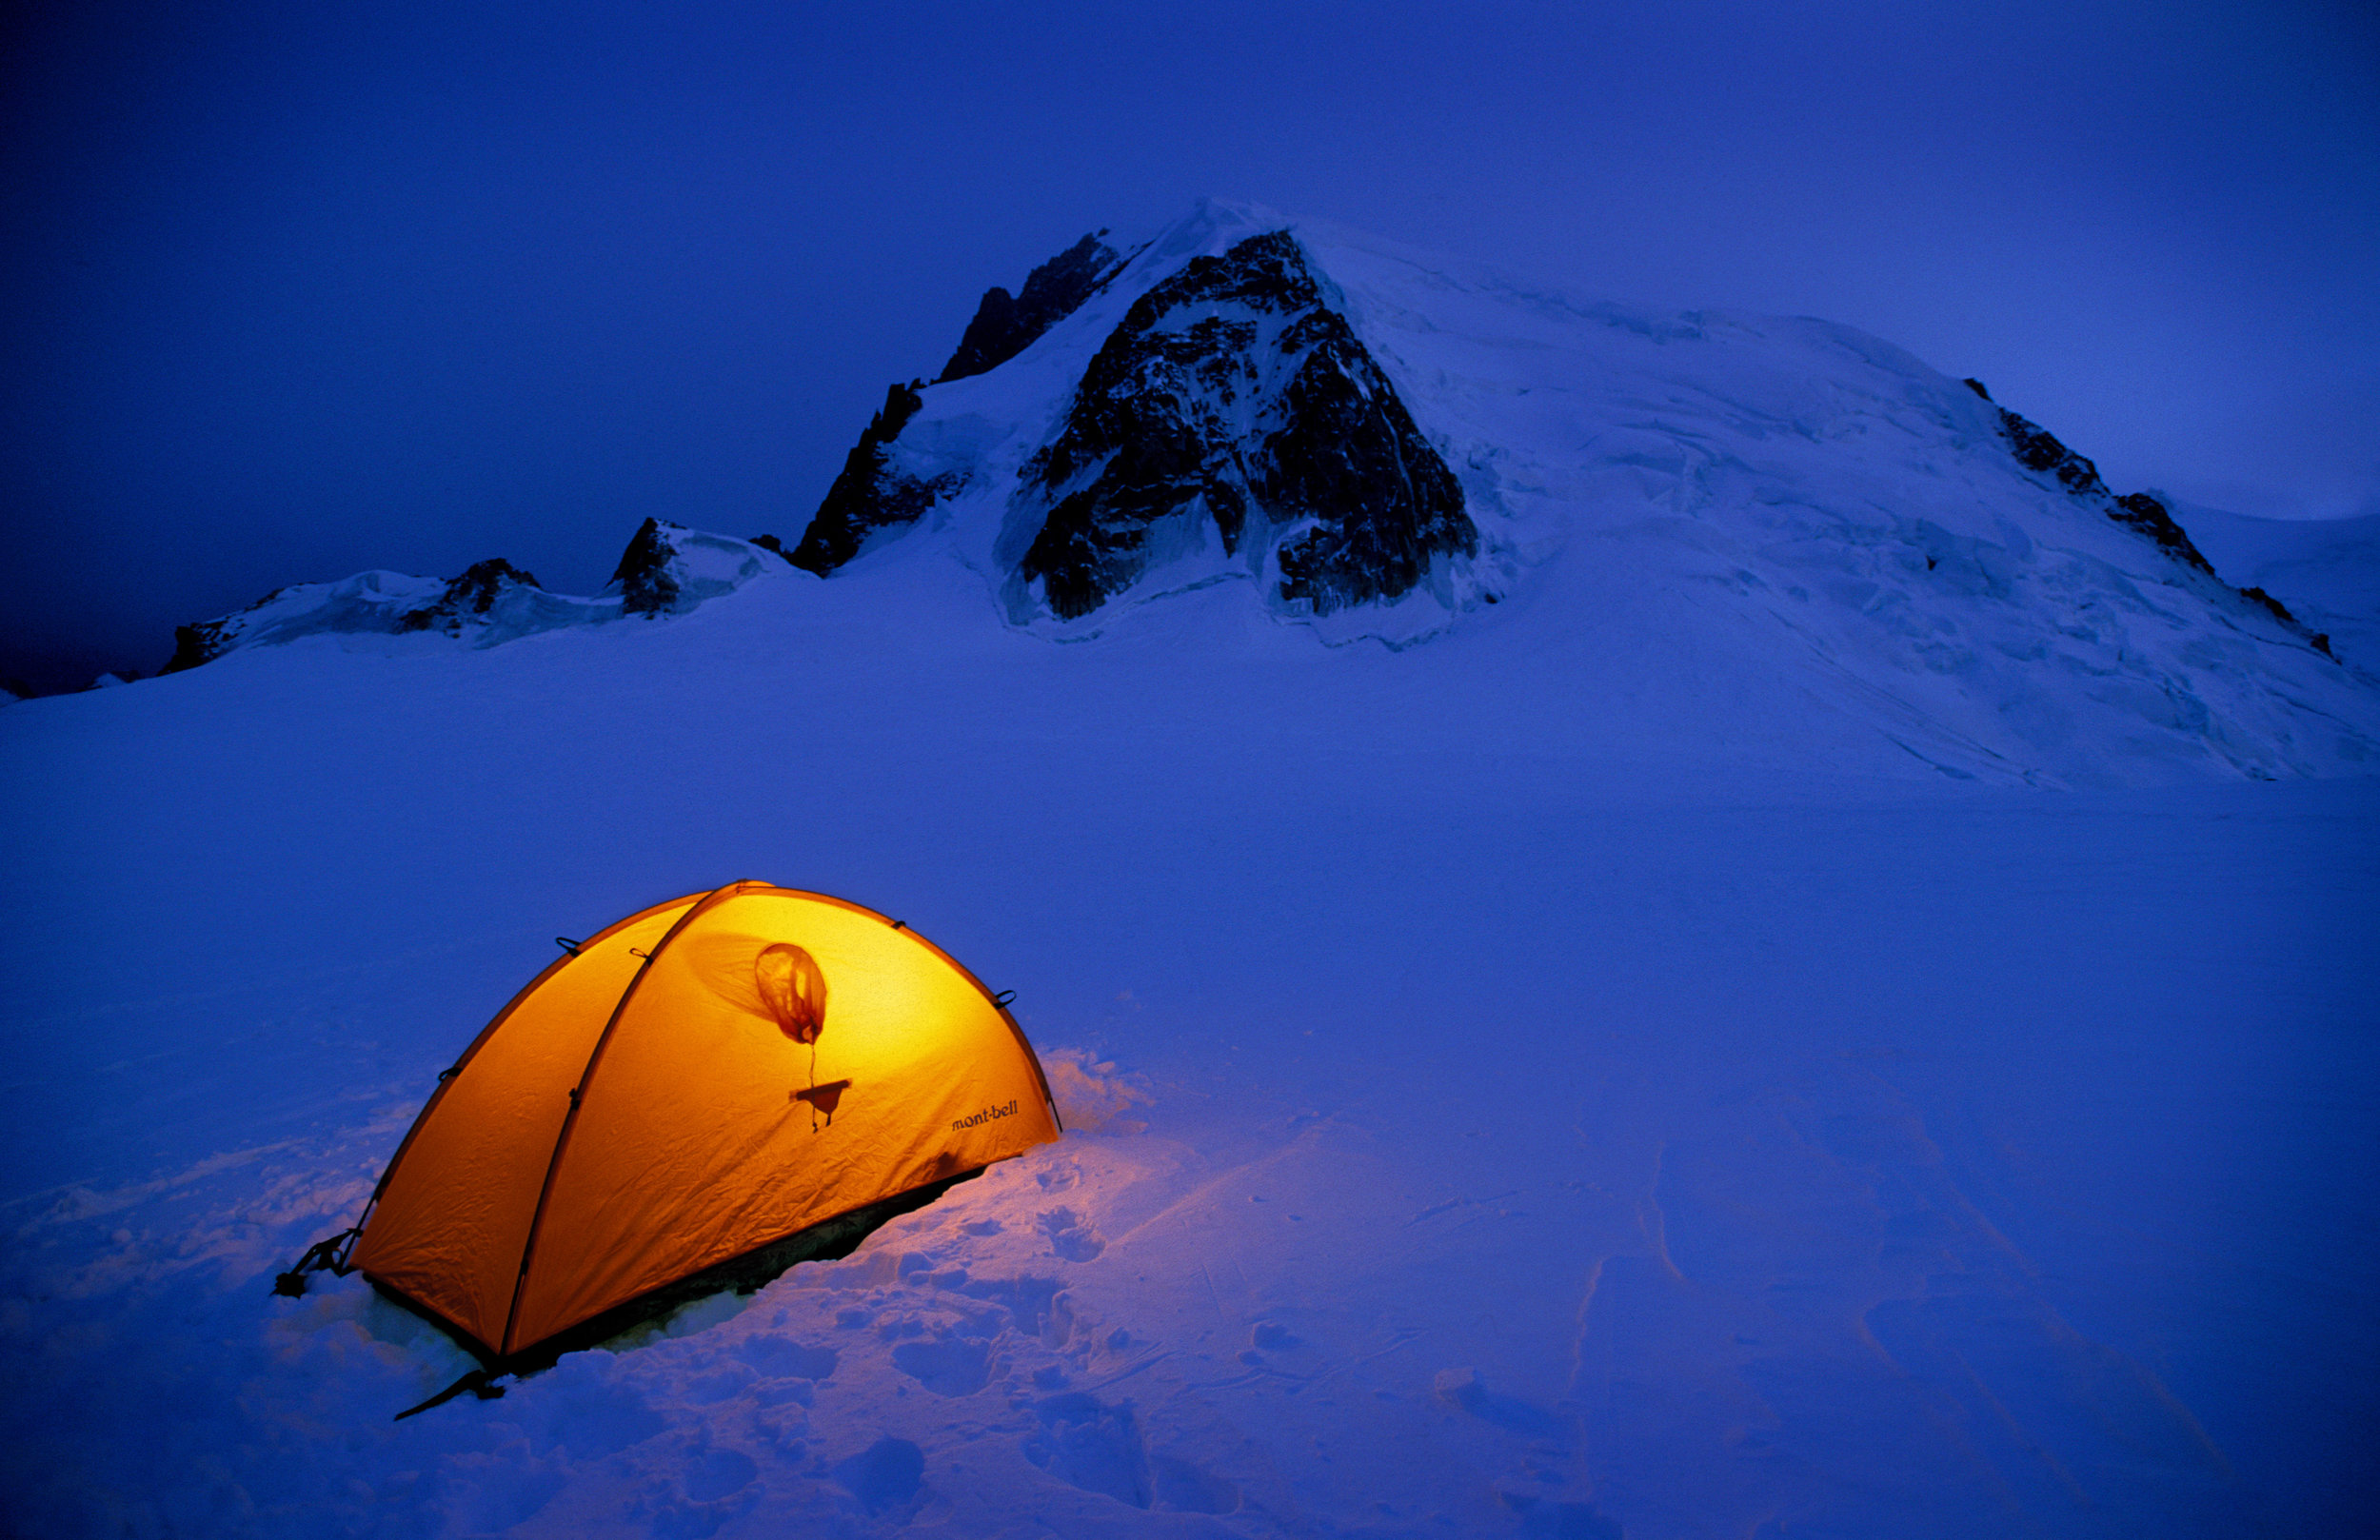 Justin Bastien & Brittany Griffith — Mont Blanc, Chamonix, France